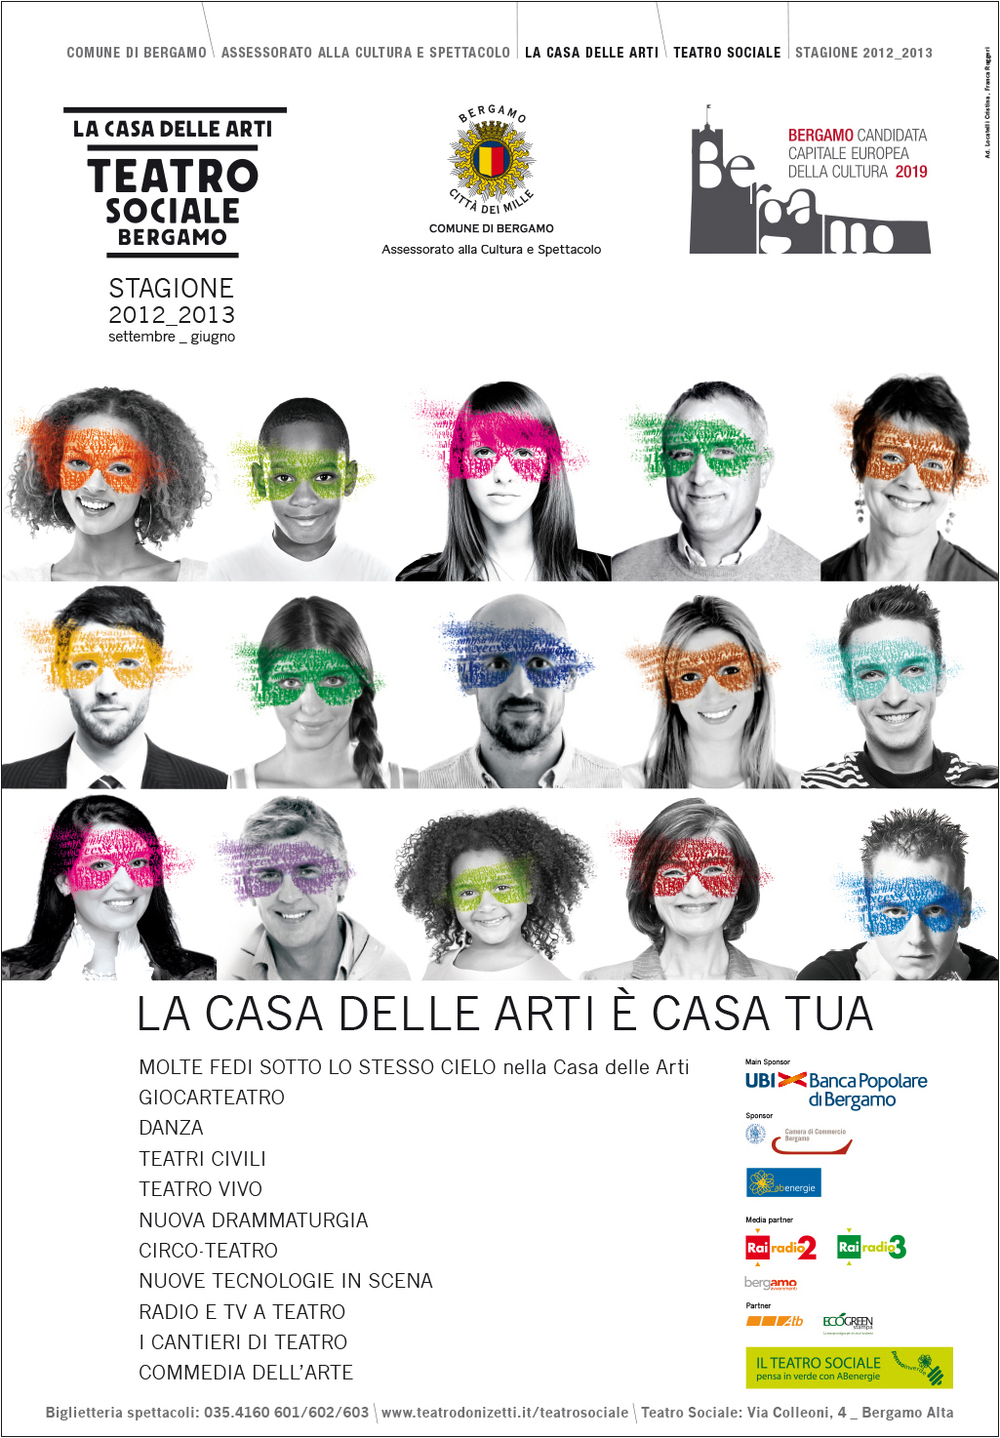 manifesto 70X100 cm, stagione 2012_2013